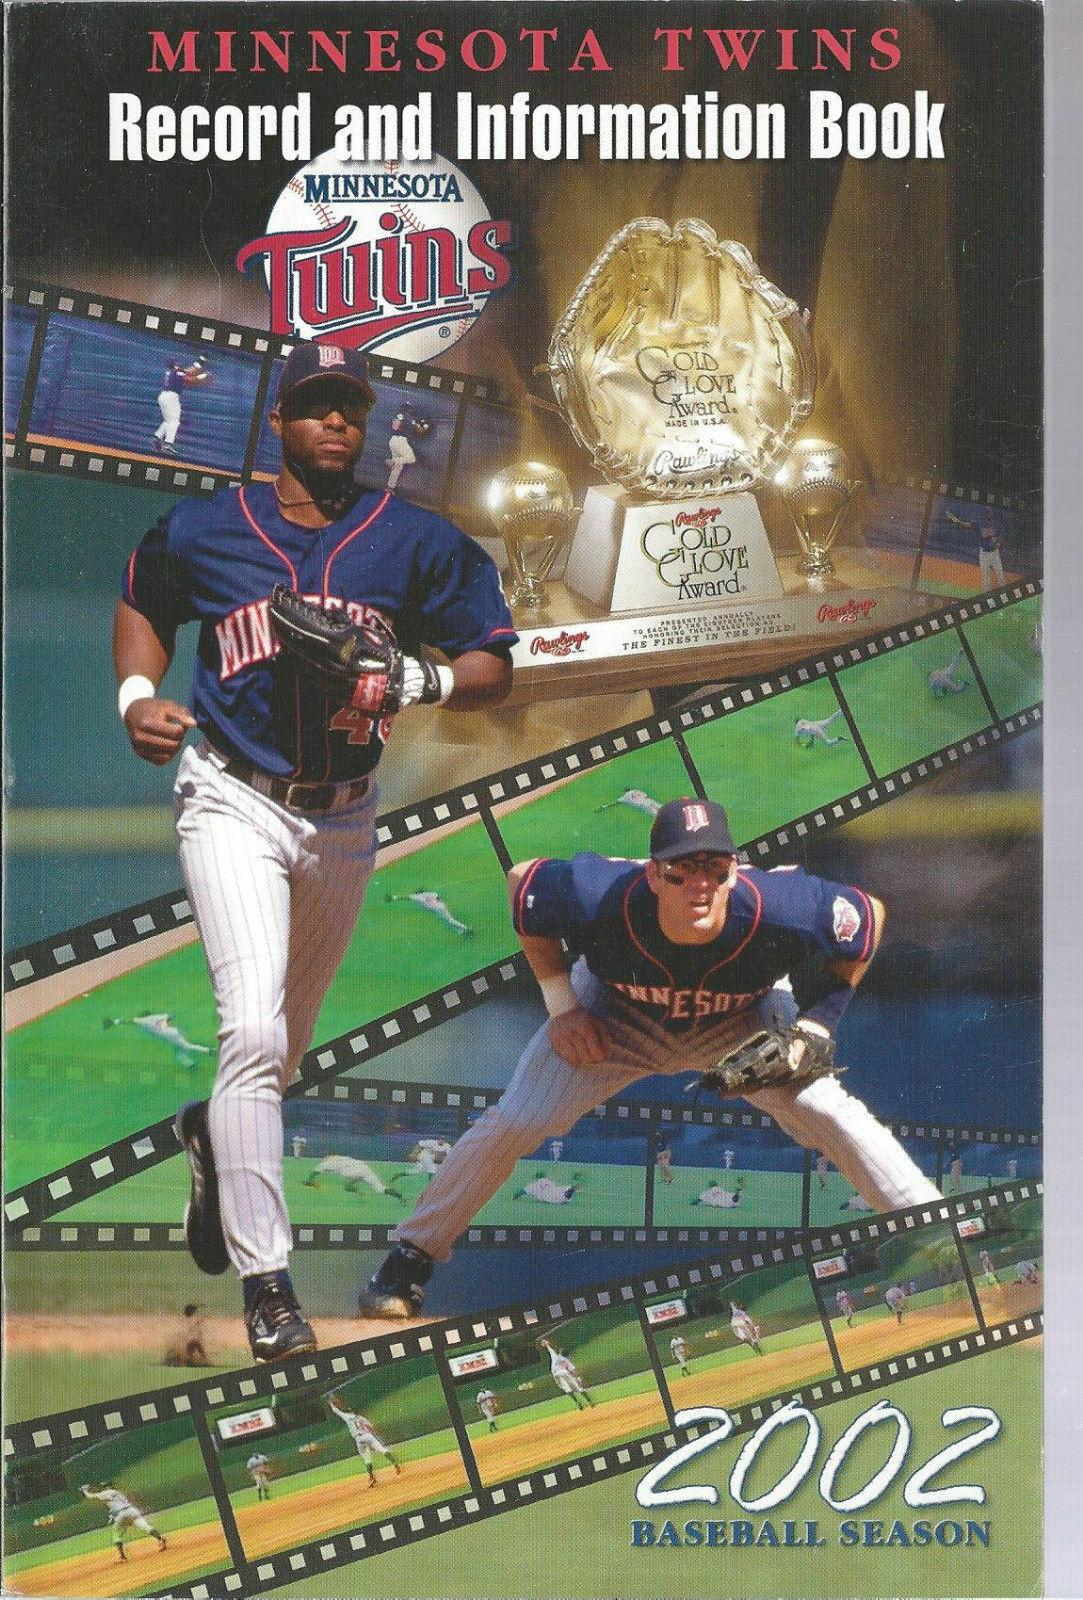 2002 Minnesota Twins Baseball MLB Media Guide - Annual Player Information